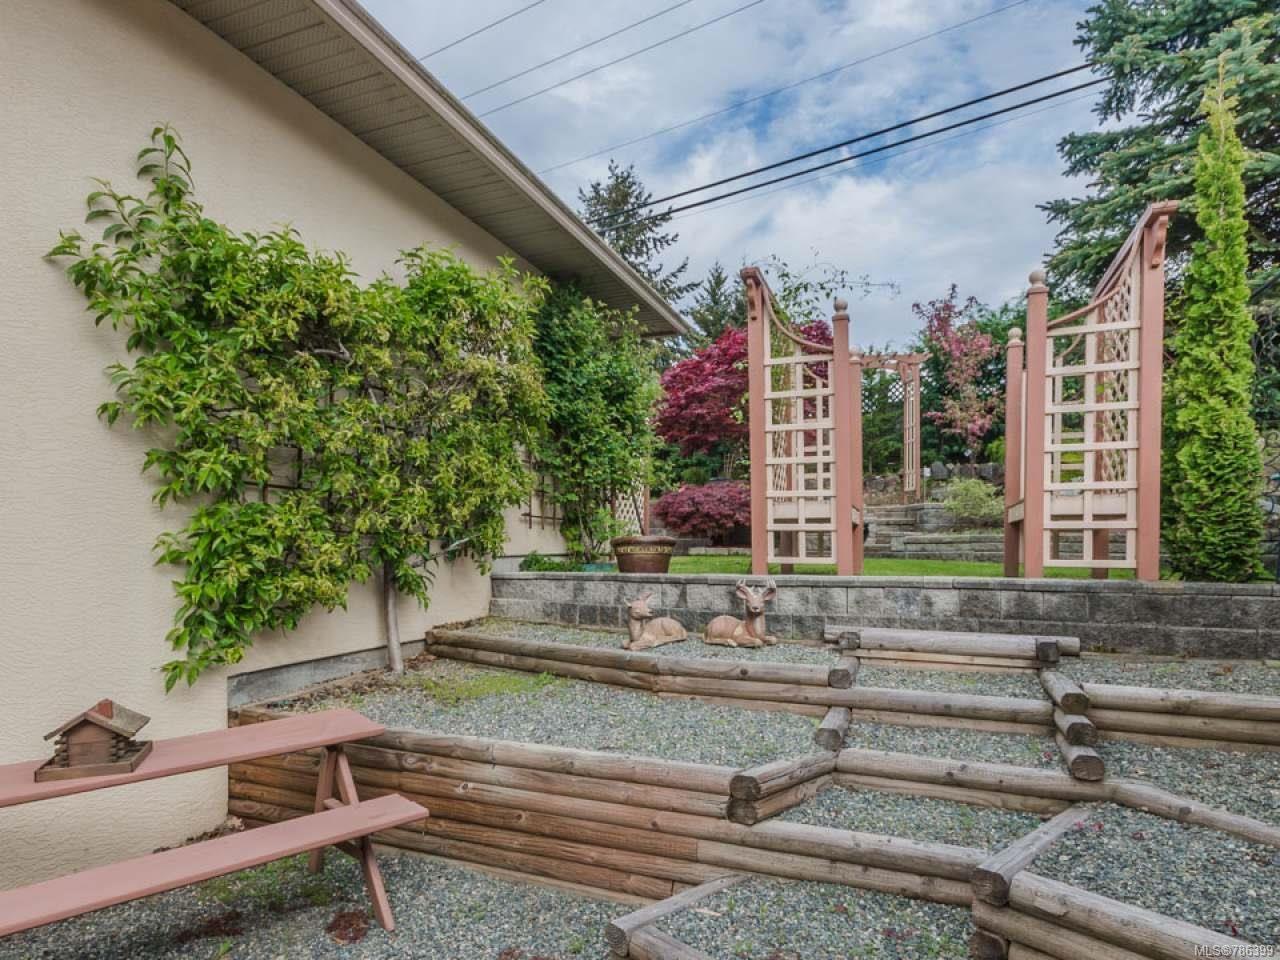 Photo 31: Photos: 5371 HIGHRIDGE PLACE in NANAIMO: Na North Nanaimo House for sale (Nanaimo)  : MLS®# 786399